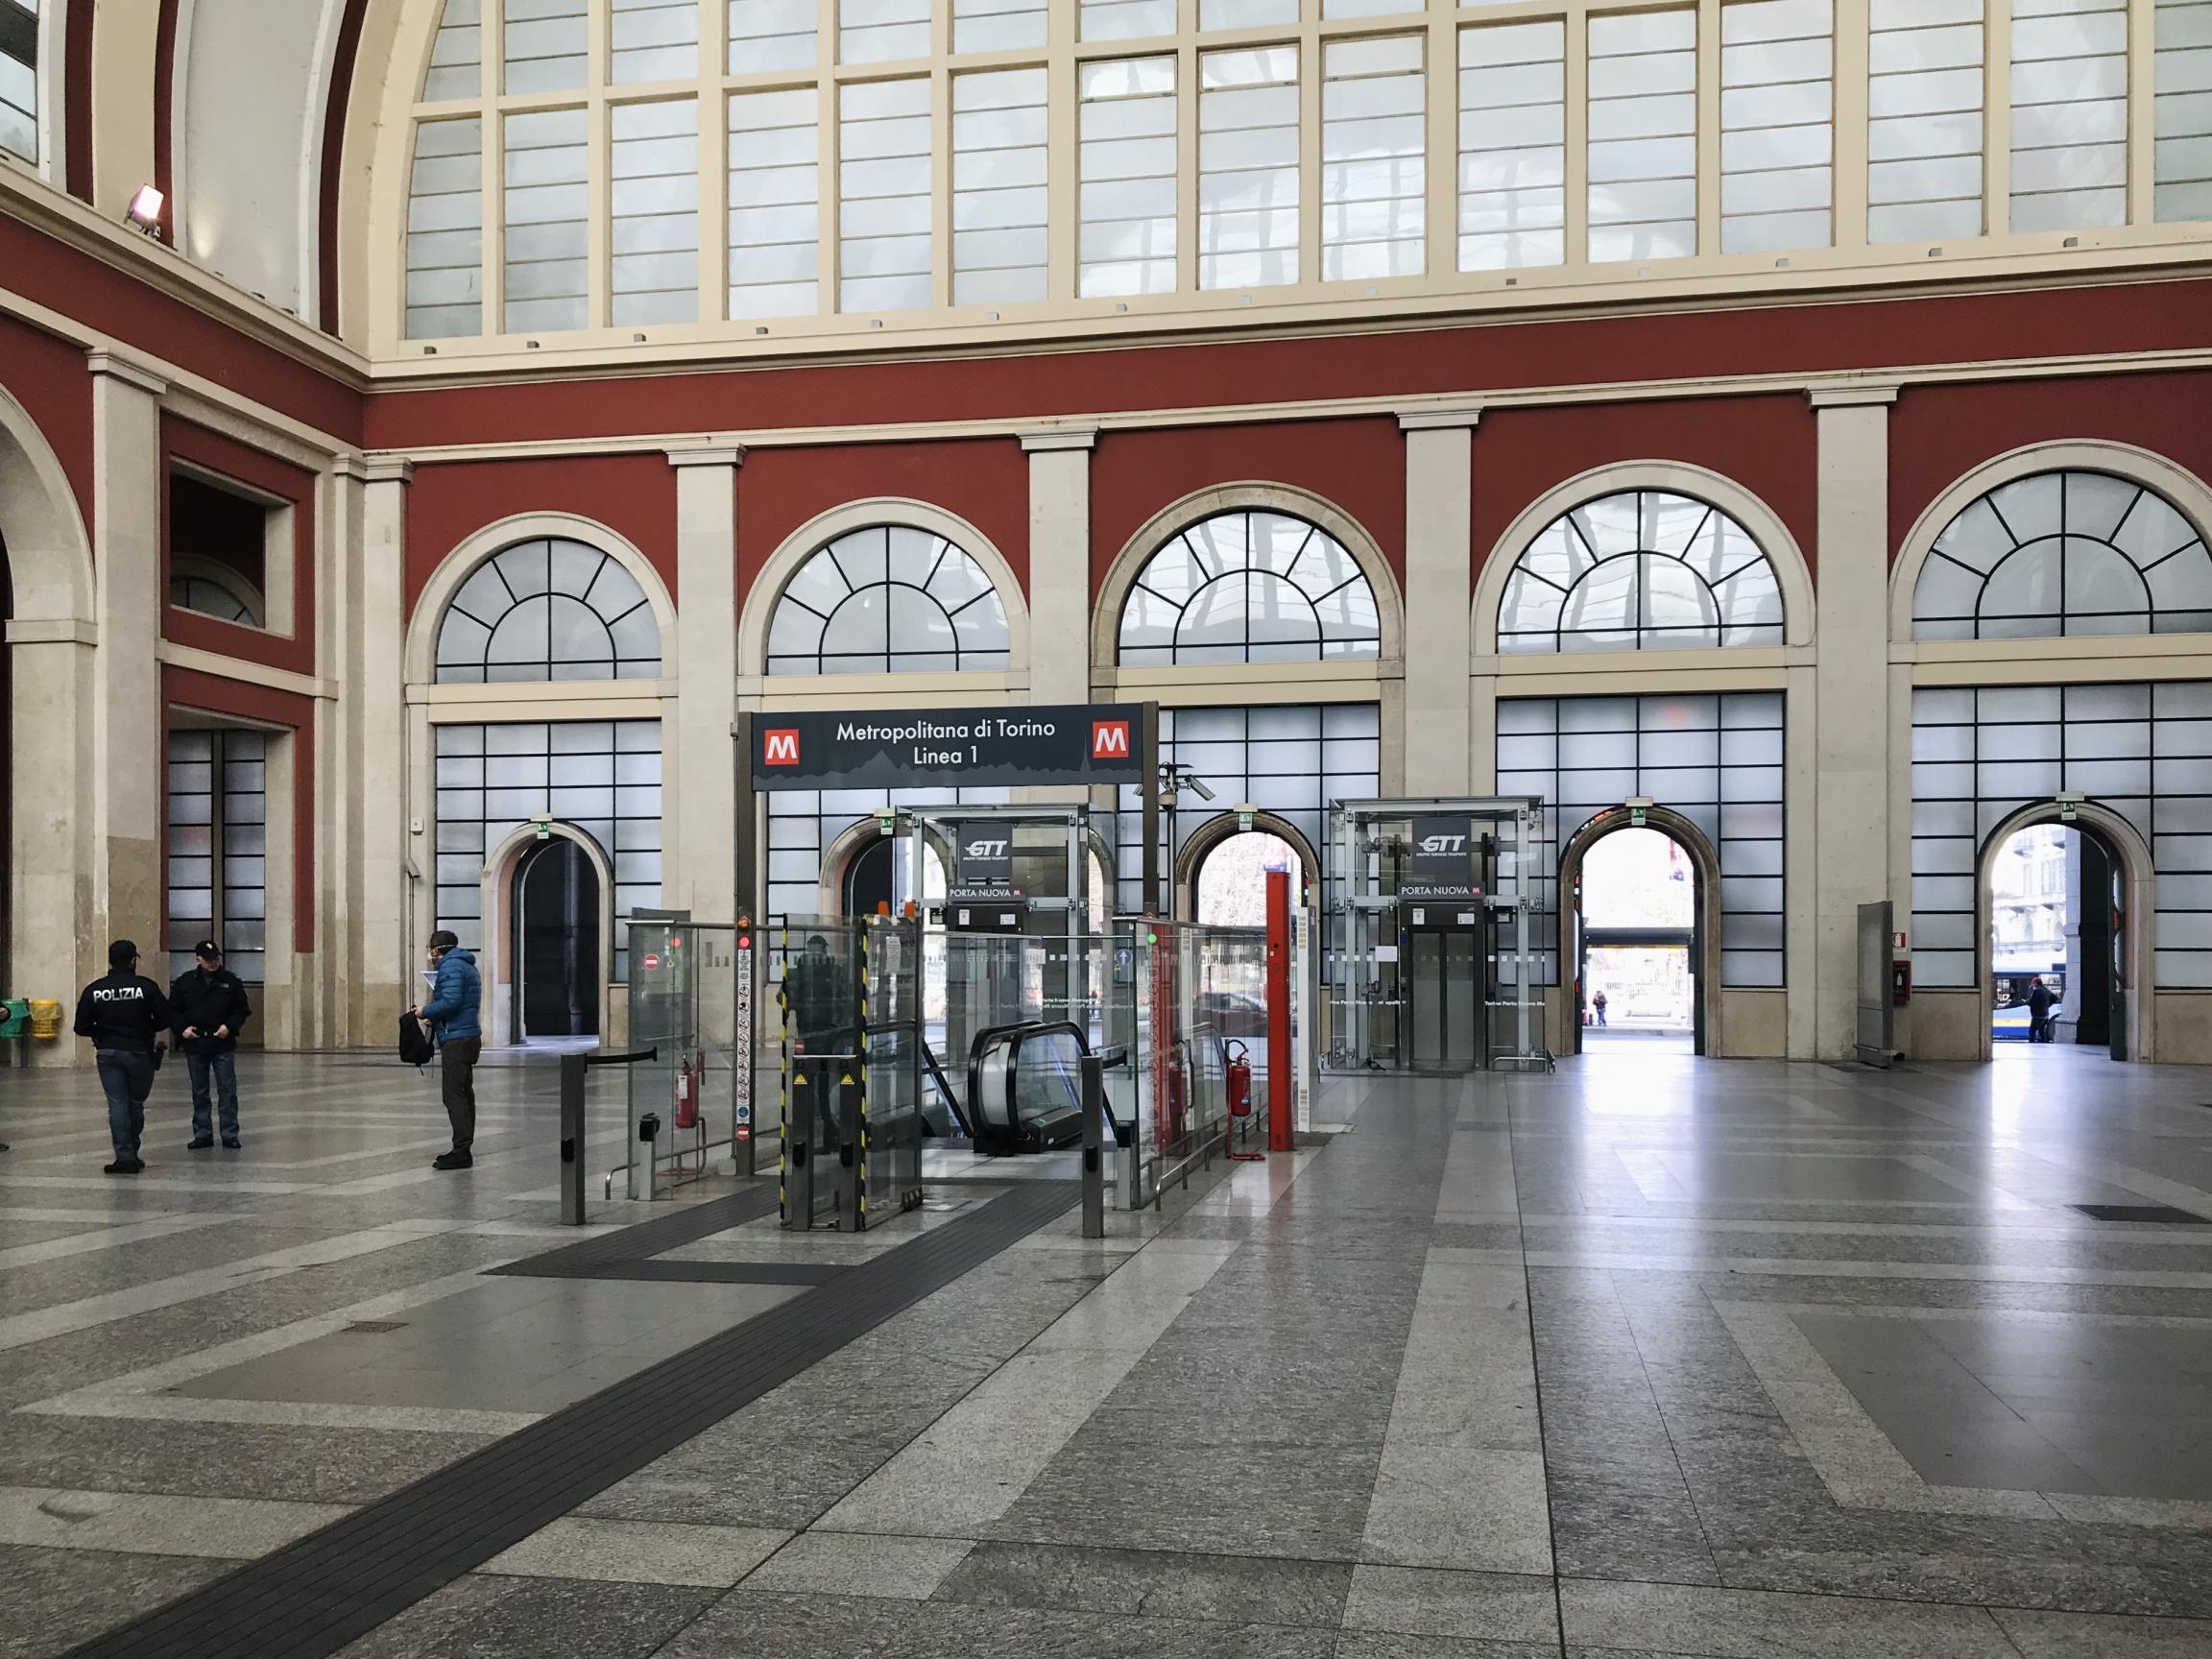 During reporter Francesca Berardi's walk last week, Turin's main train station, Porta Nuova, was semideserted.